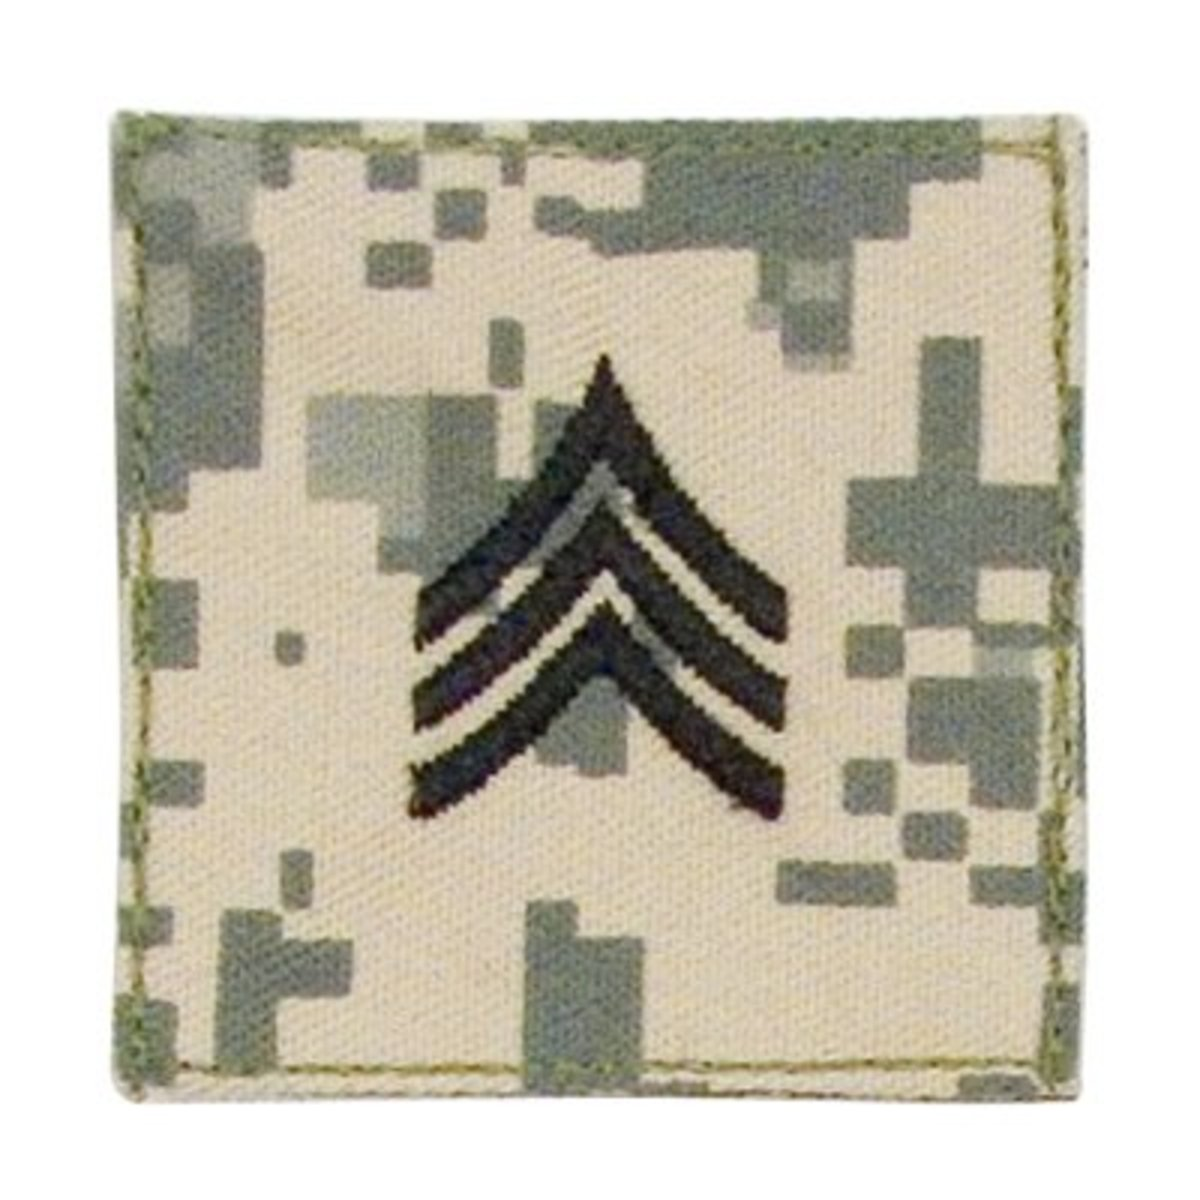 Sergeant (E5)